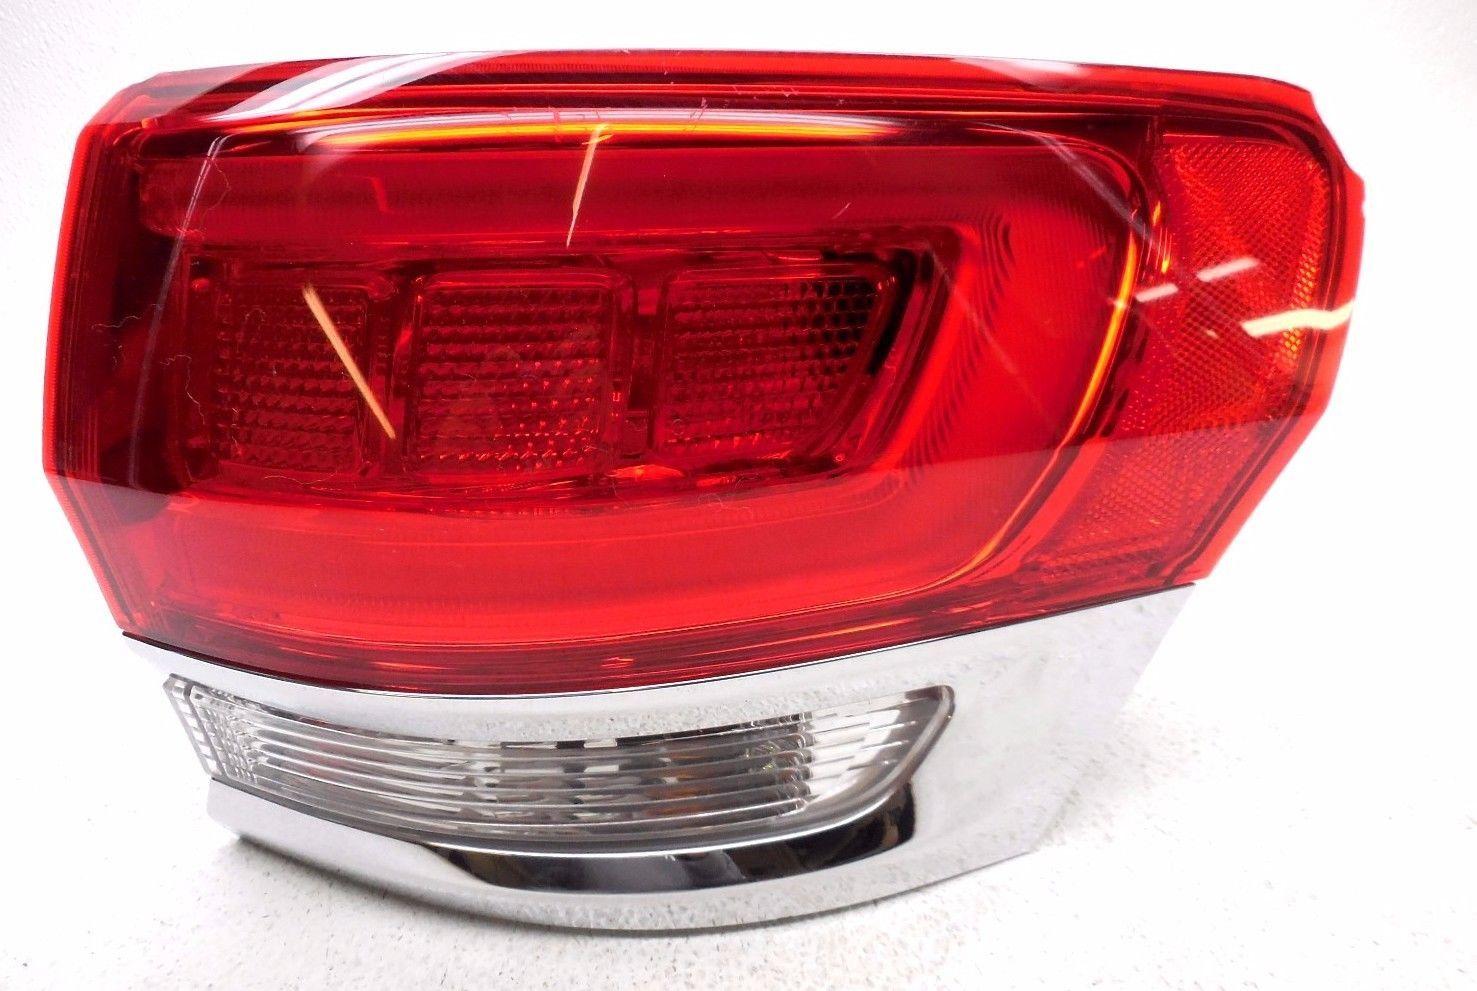 Jeep Tail Light Lenses : Oem jeep grand cherokee right led tail light